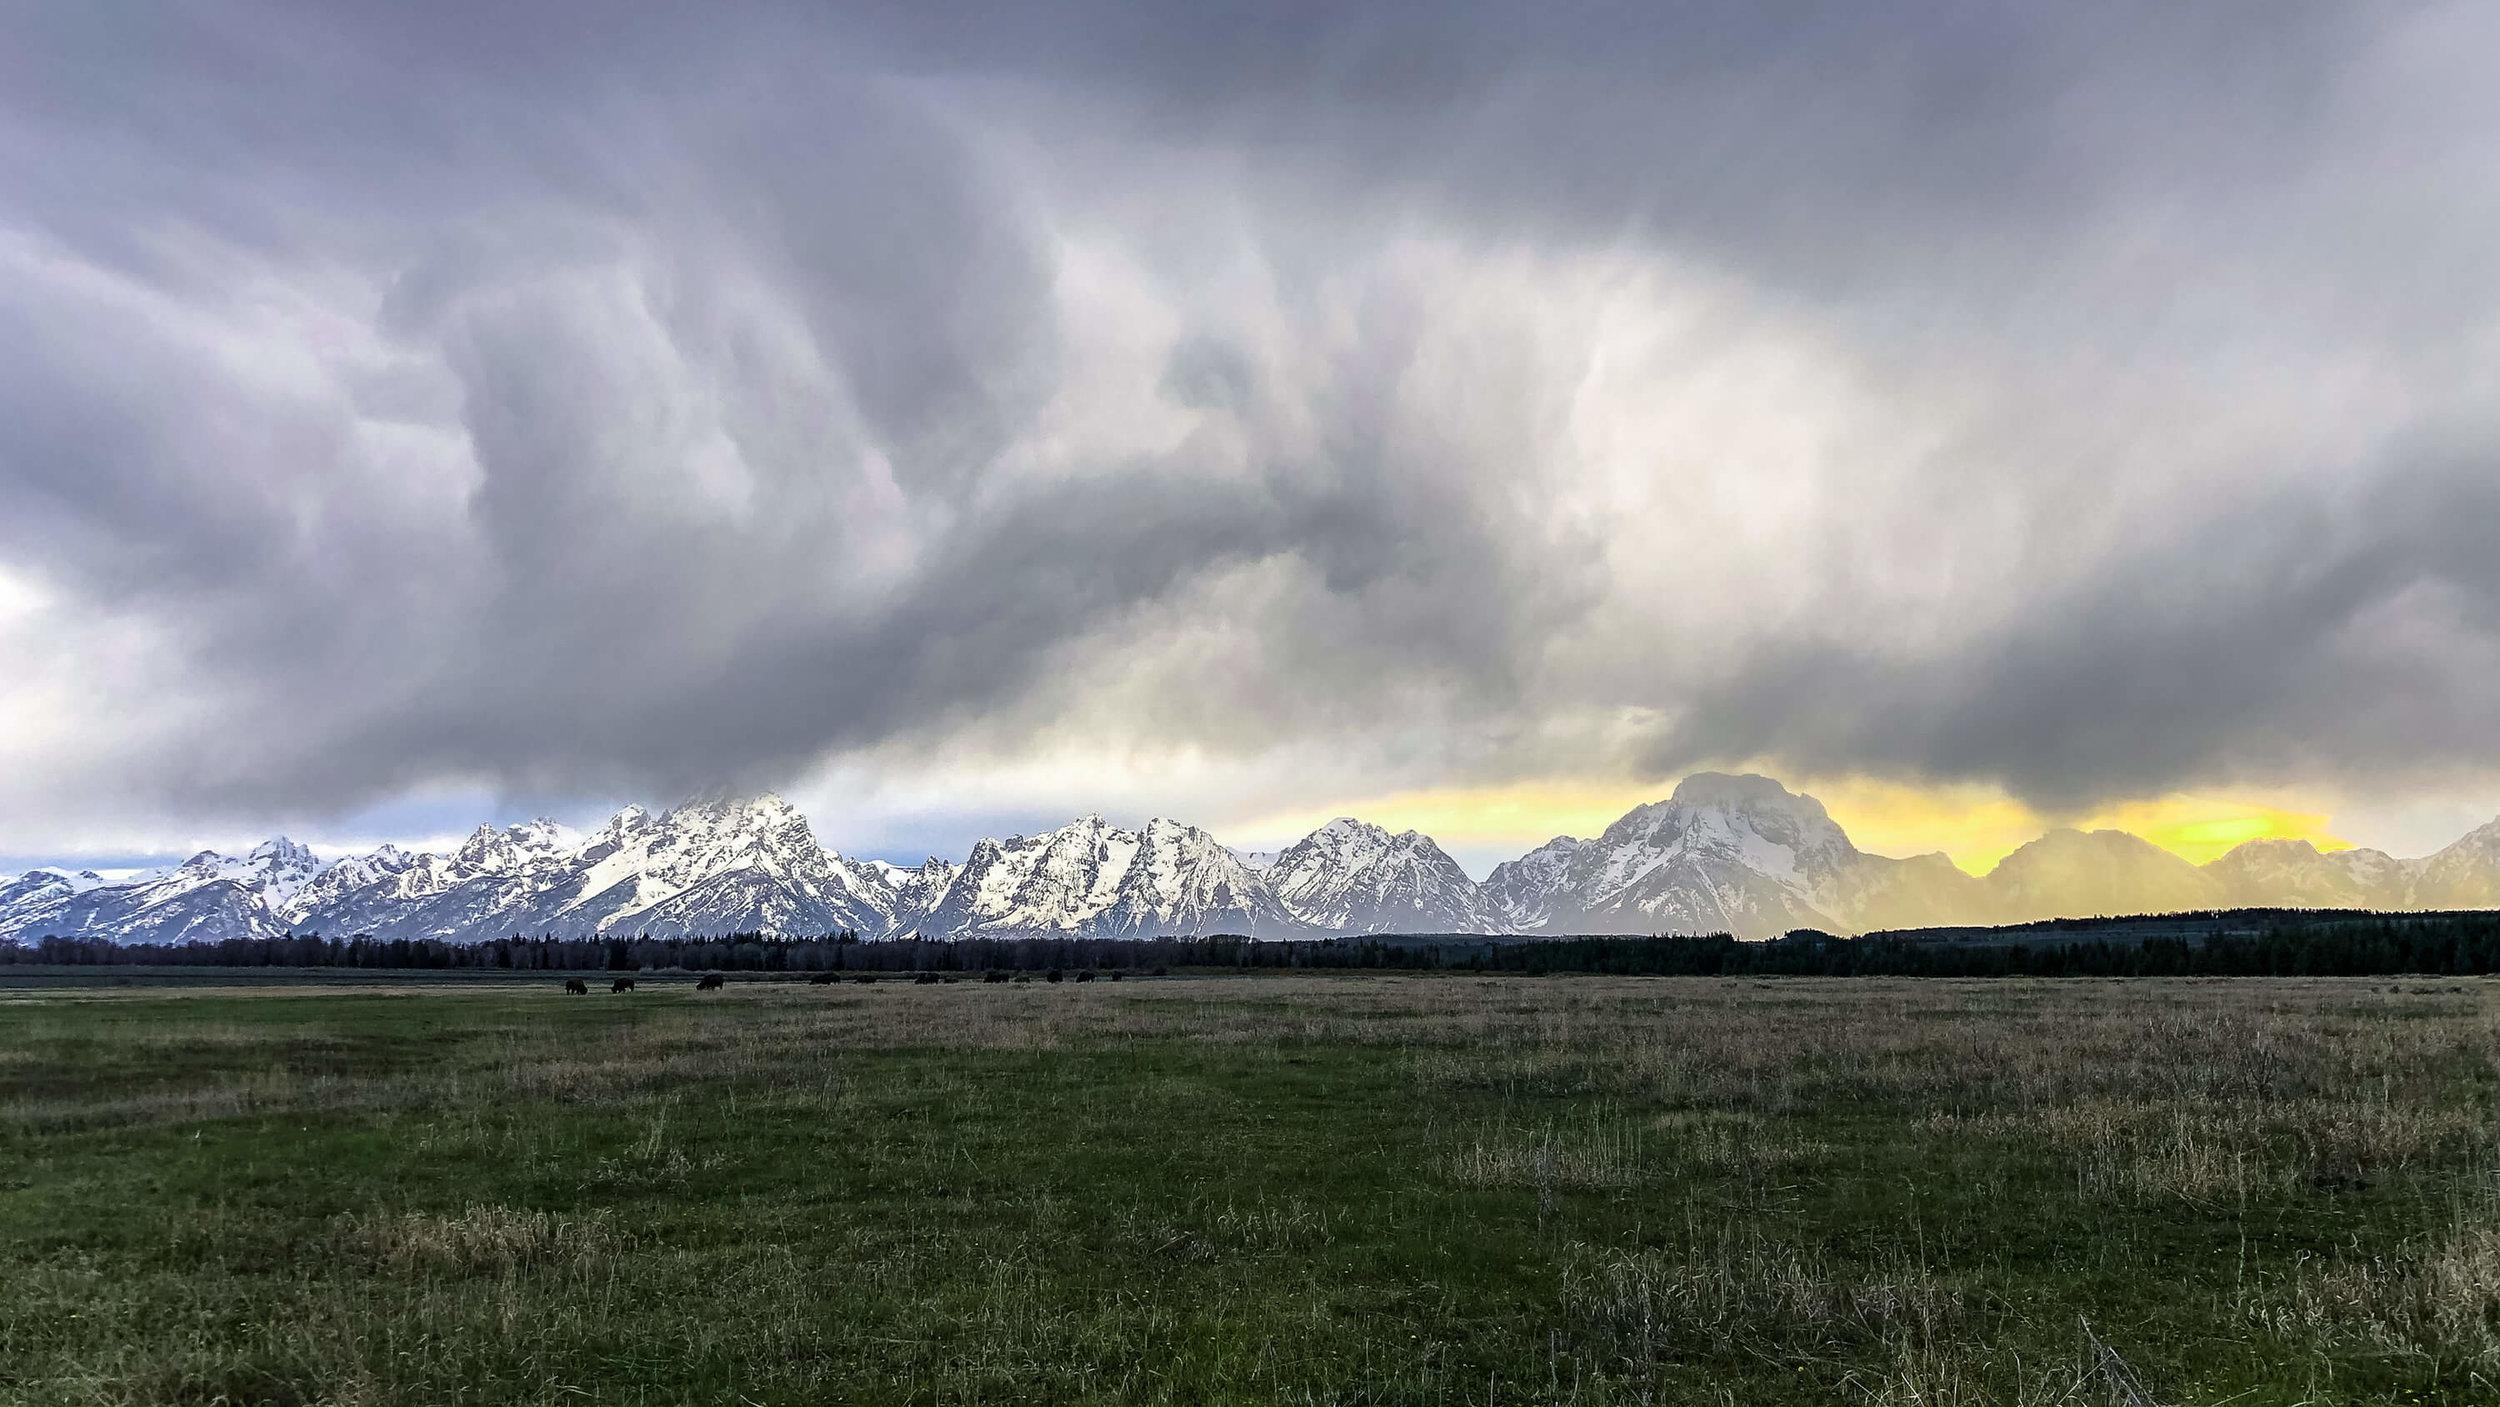 Bison herd in front of the Teton range